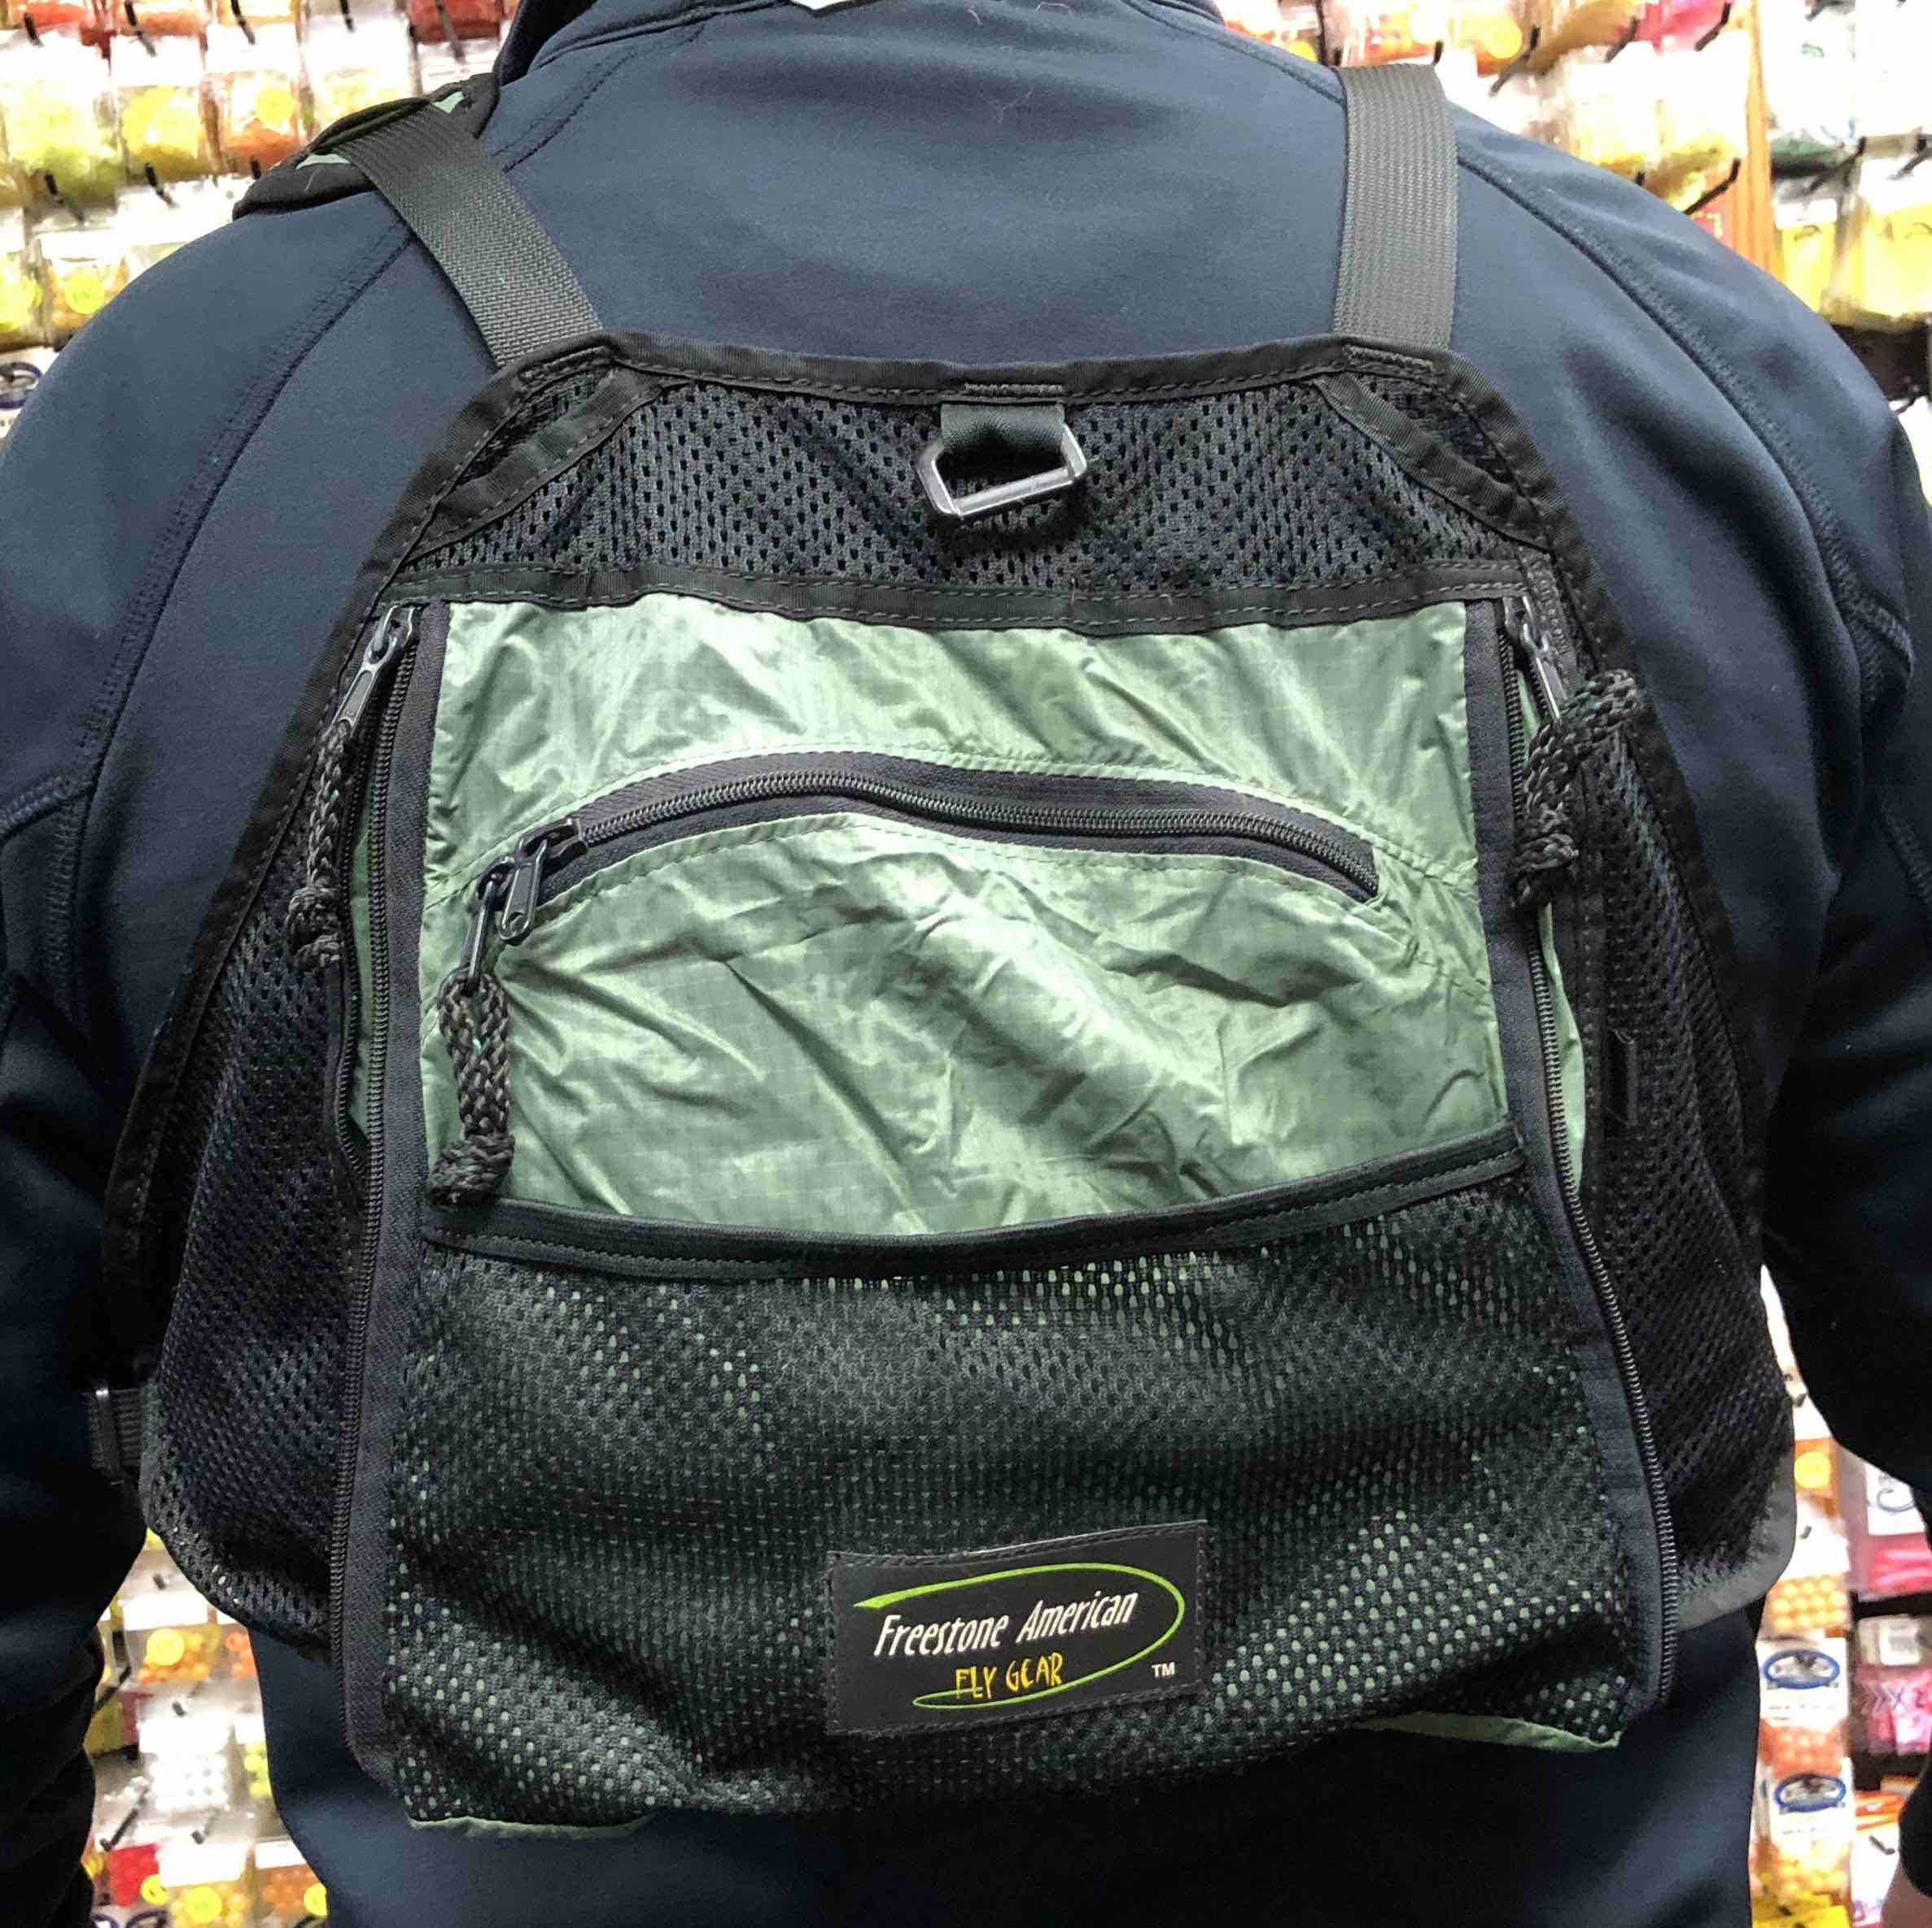 Freestone America Vest - Adjustable Size - LIKE NEW! - $30